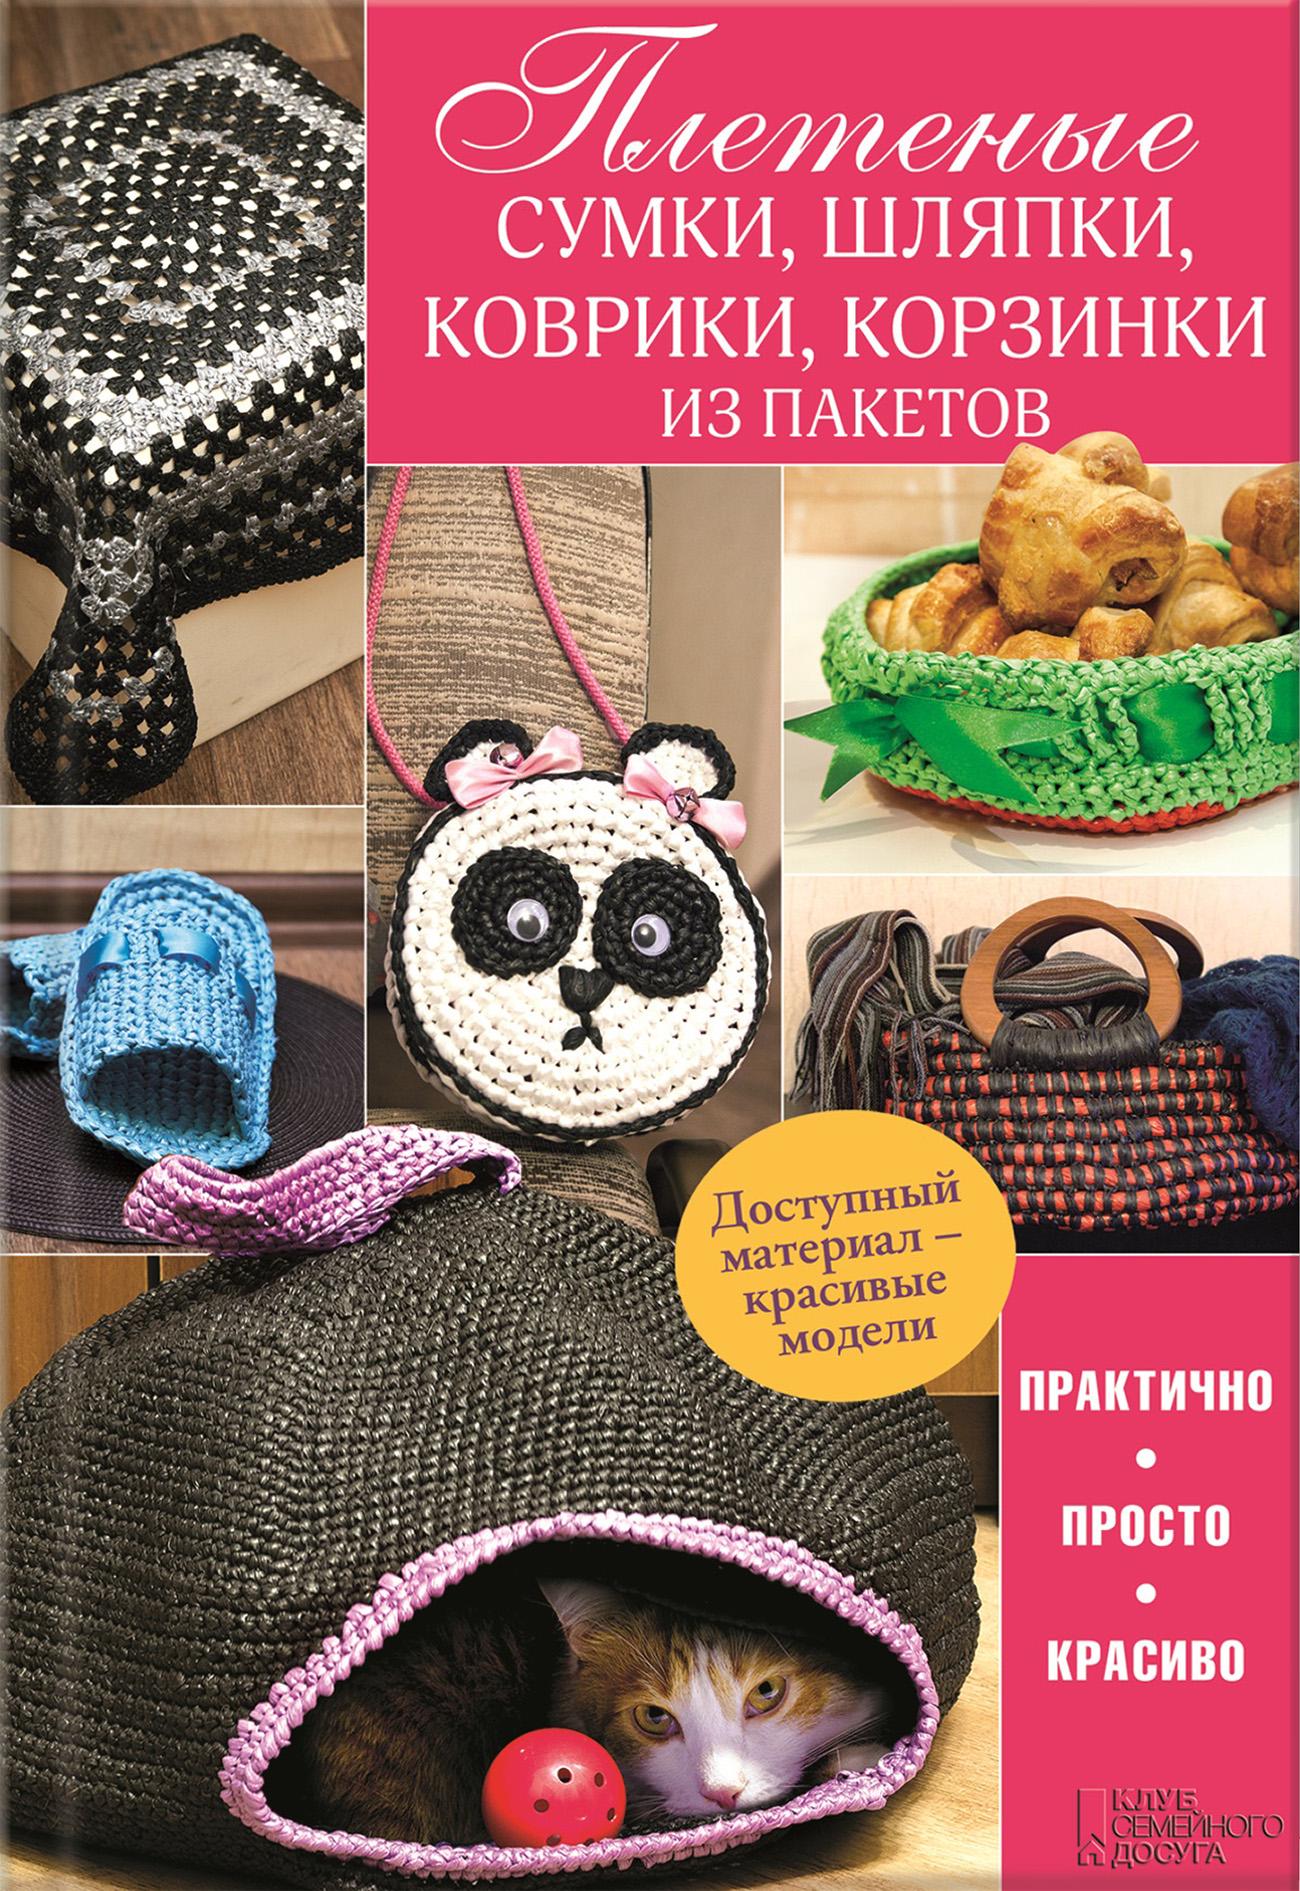 Марина Бондаренко Плетеные сумки, шляпки, коврики, корзинки из пакетов